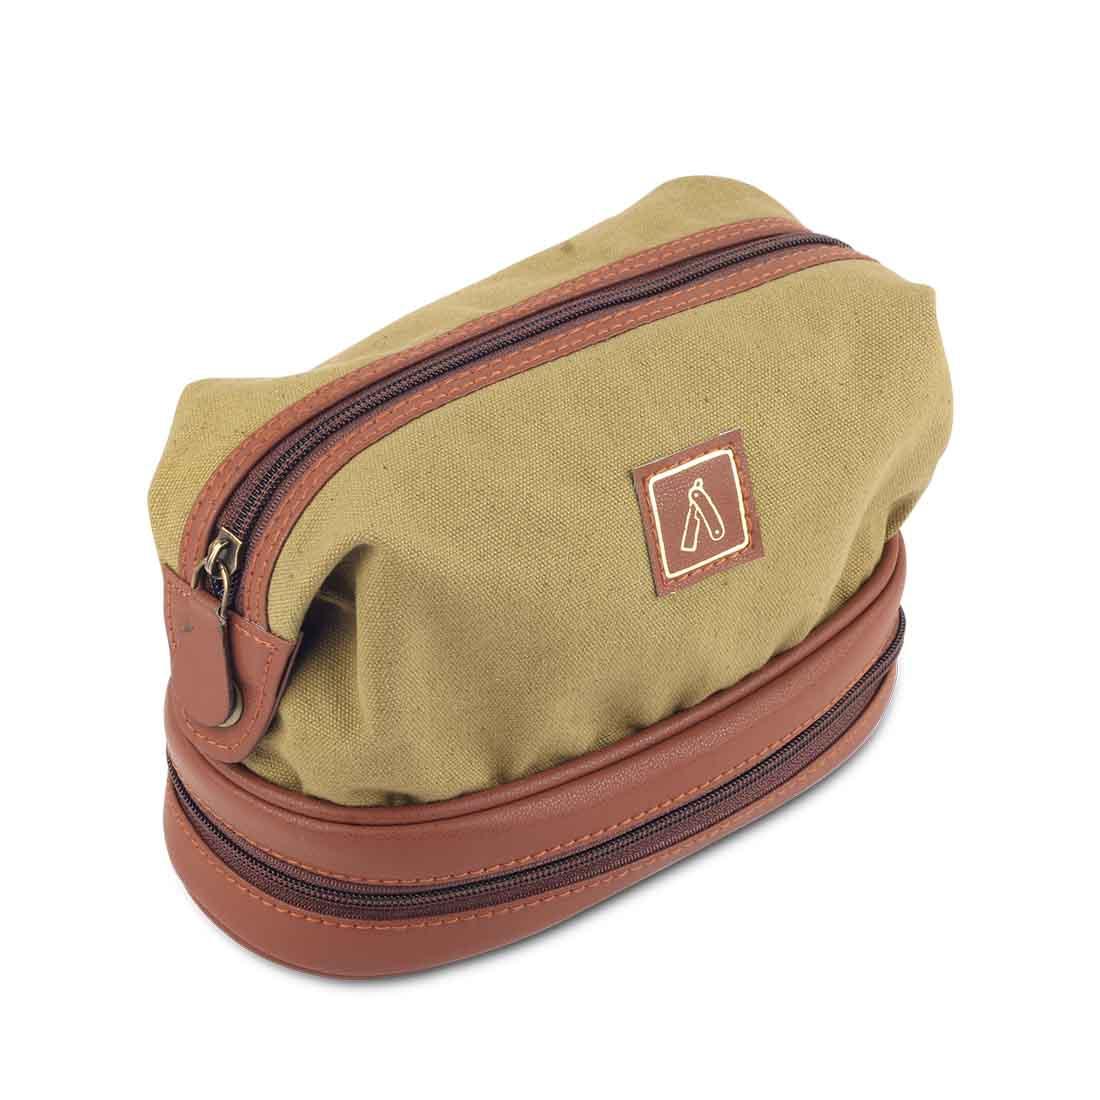 Ustraa Travel Kit